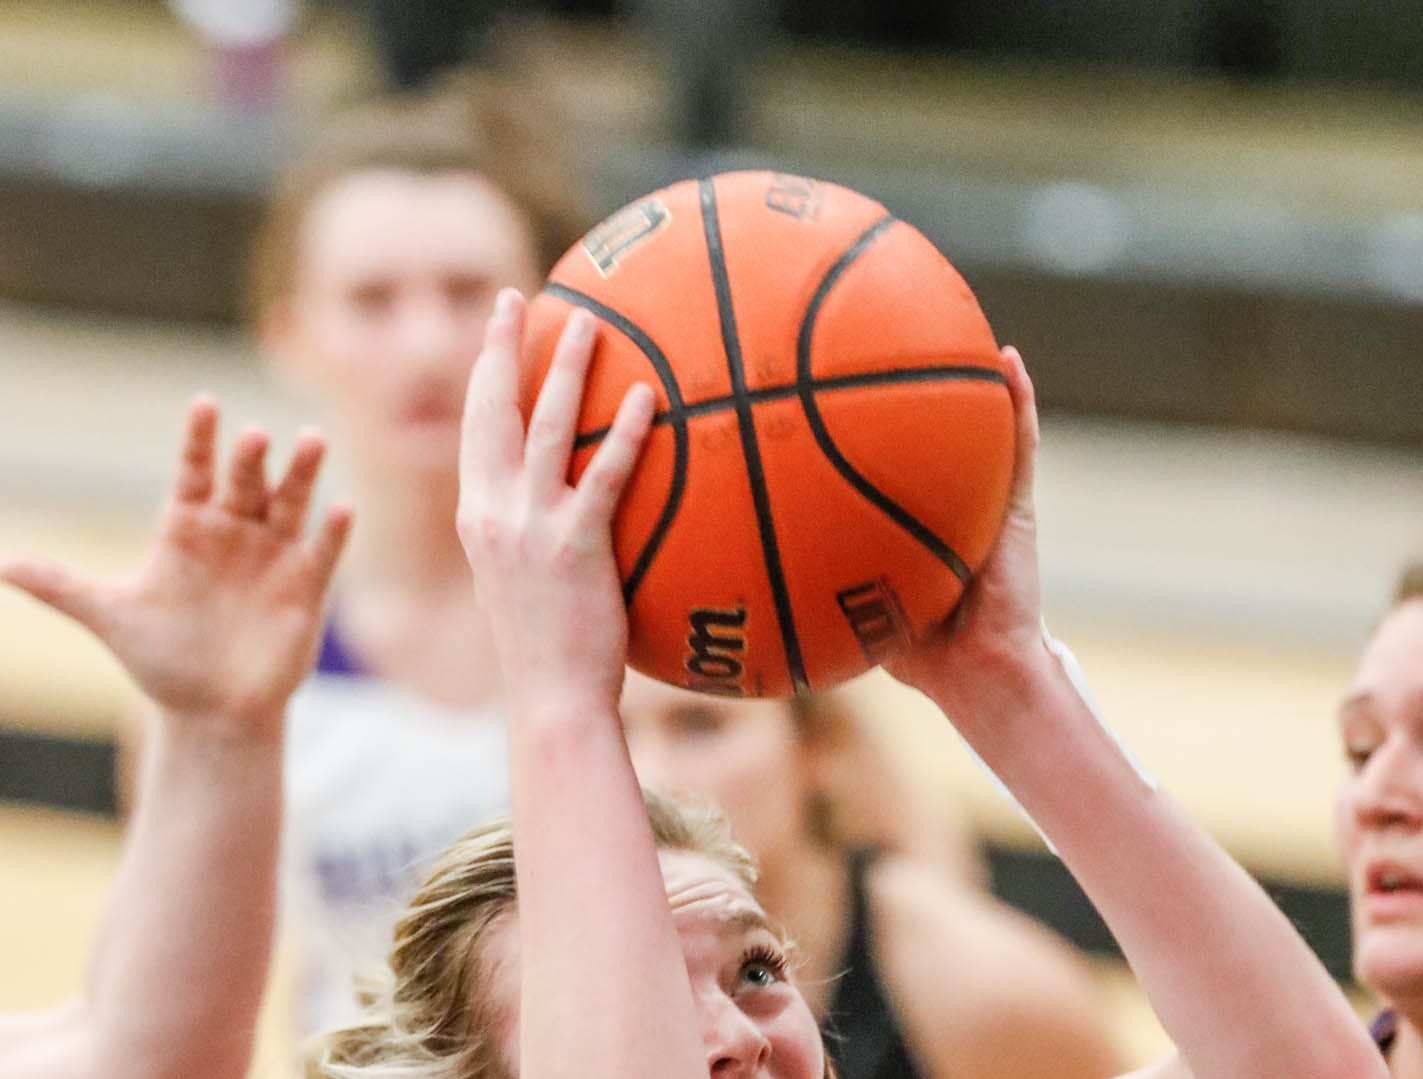 Brownsburg High School's forward Mackenzie Stien (44), grabs a rebound during a 2019 Hendricks County Basketball Tournament game between the Avon High School girls varsity basketball team and Brownsburg High School, held at Cascade High School on Saturday, Jan. 5, 2019.